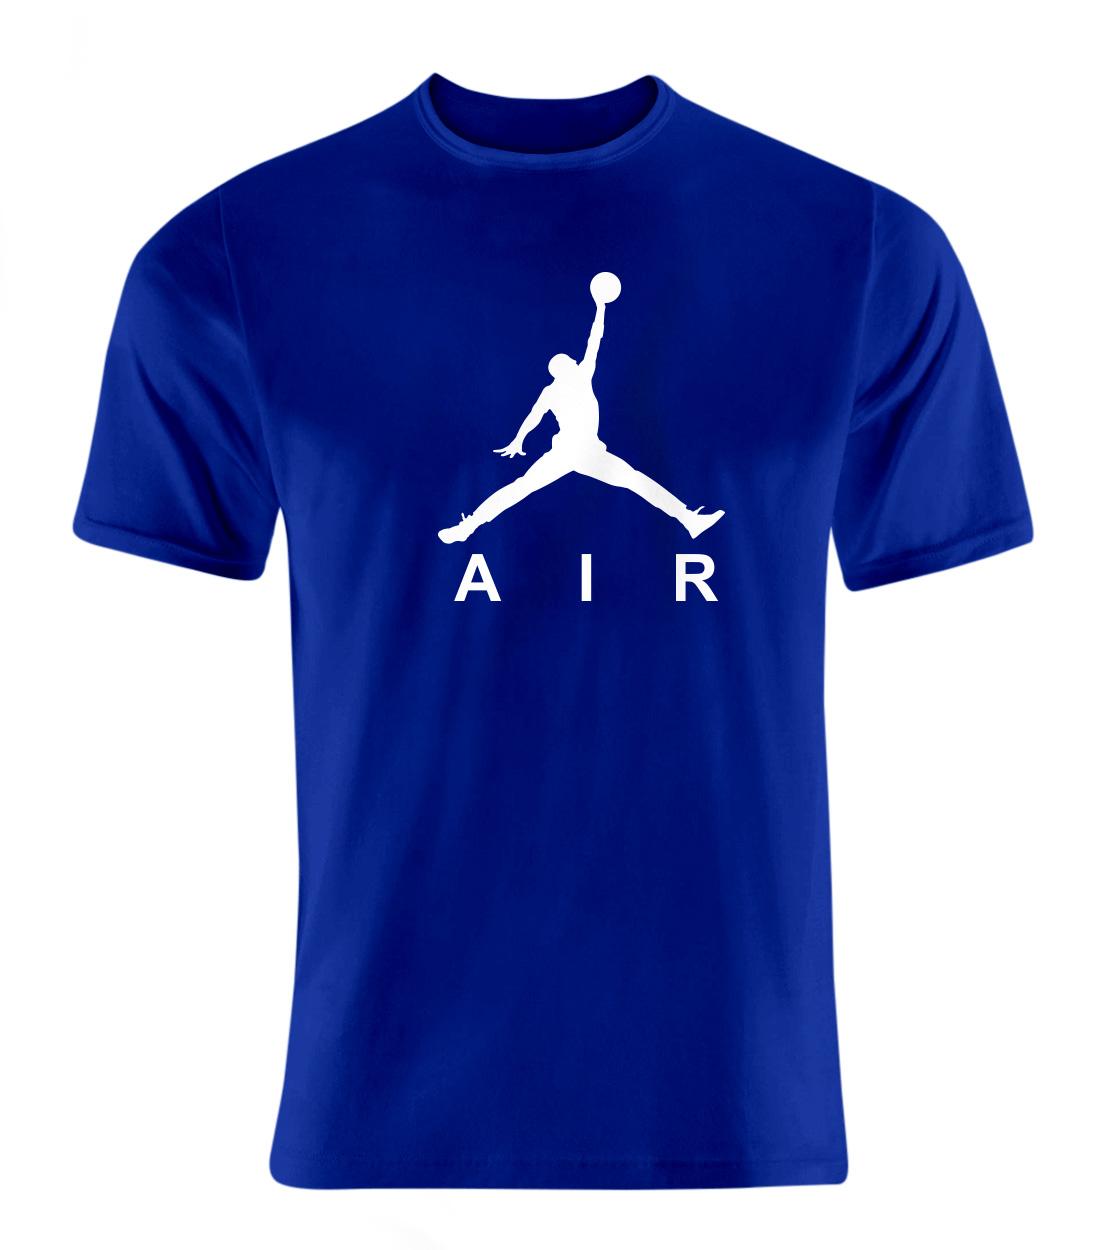 Air Jordan Tshirt (TSH-BLU-8-PLYR-JORDAN.AIR)